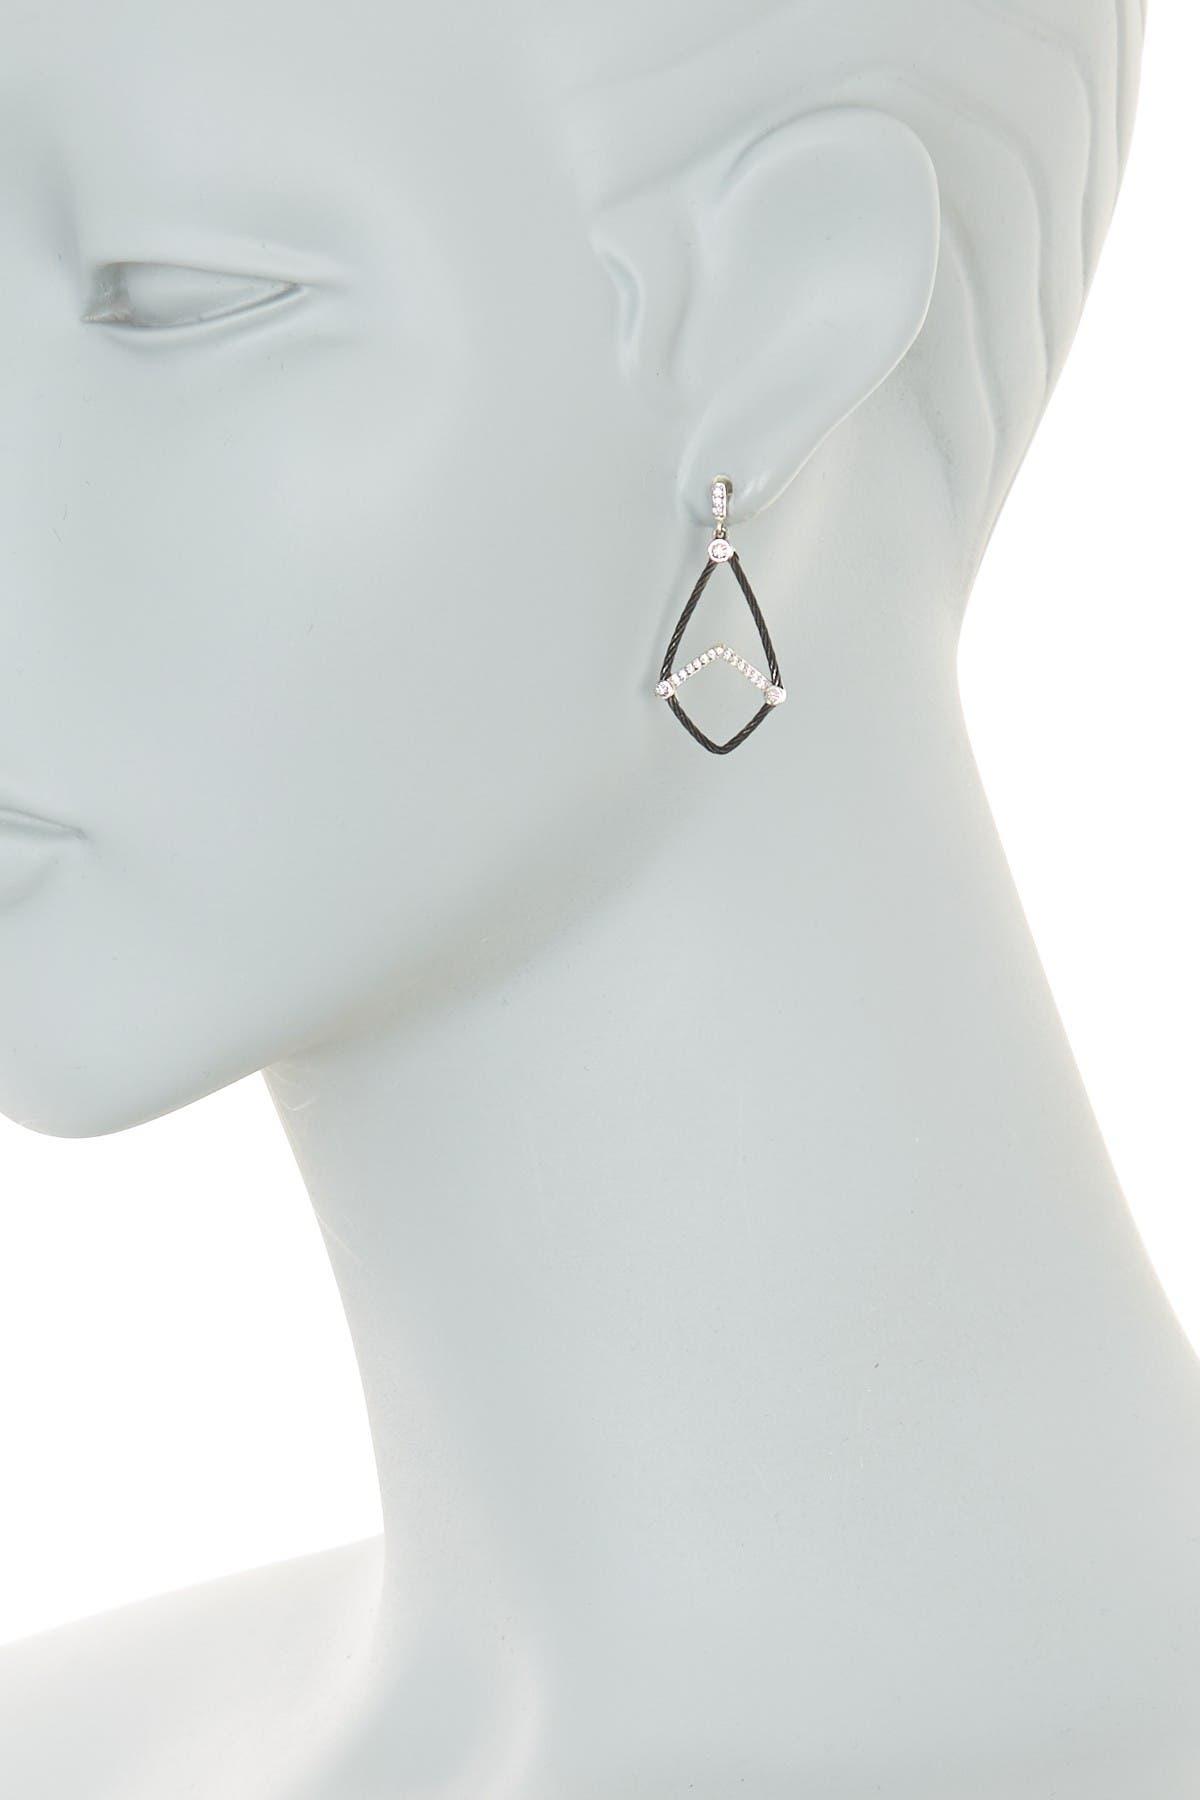 Image of ALOR 18K White Gold Black Cable Diamond Drop Earrings - 0.19 ctw